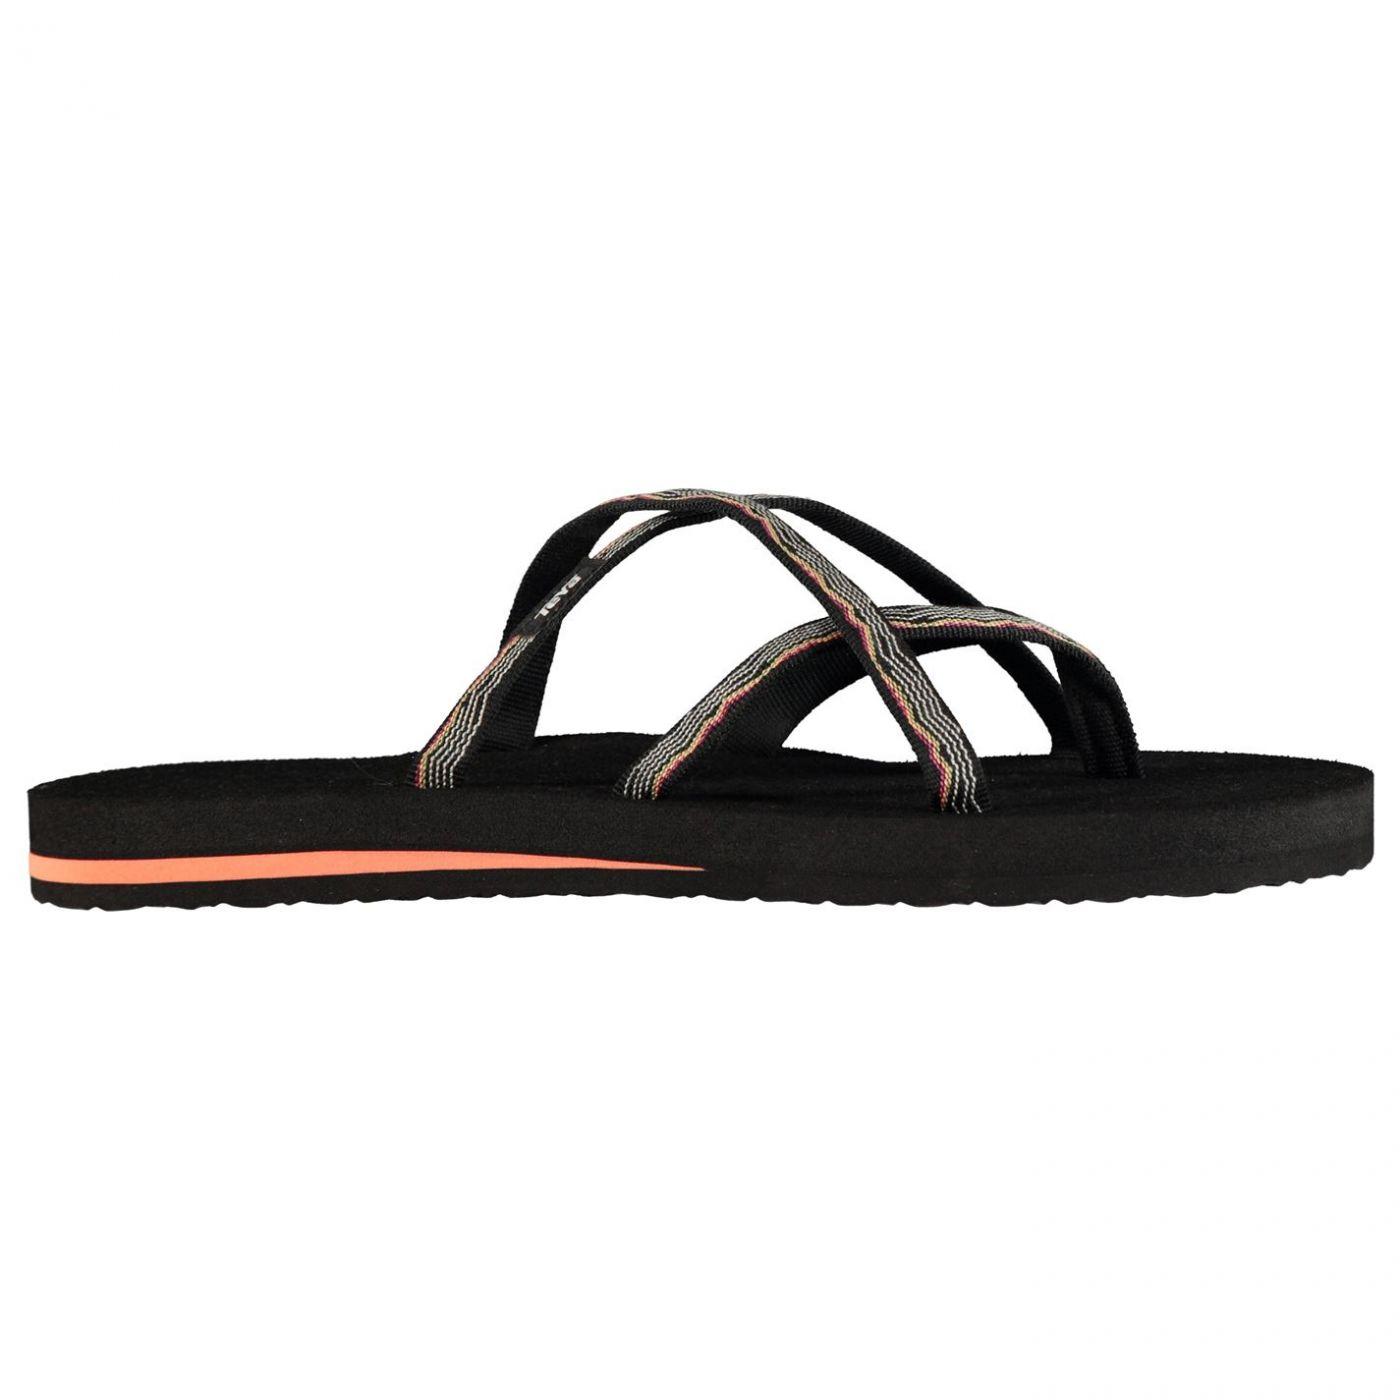 check out de377 63ec5 Teva Olowahu Ladies Flip Flops - FACTCOOL